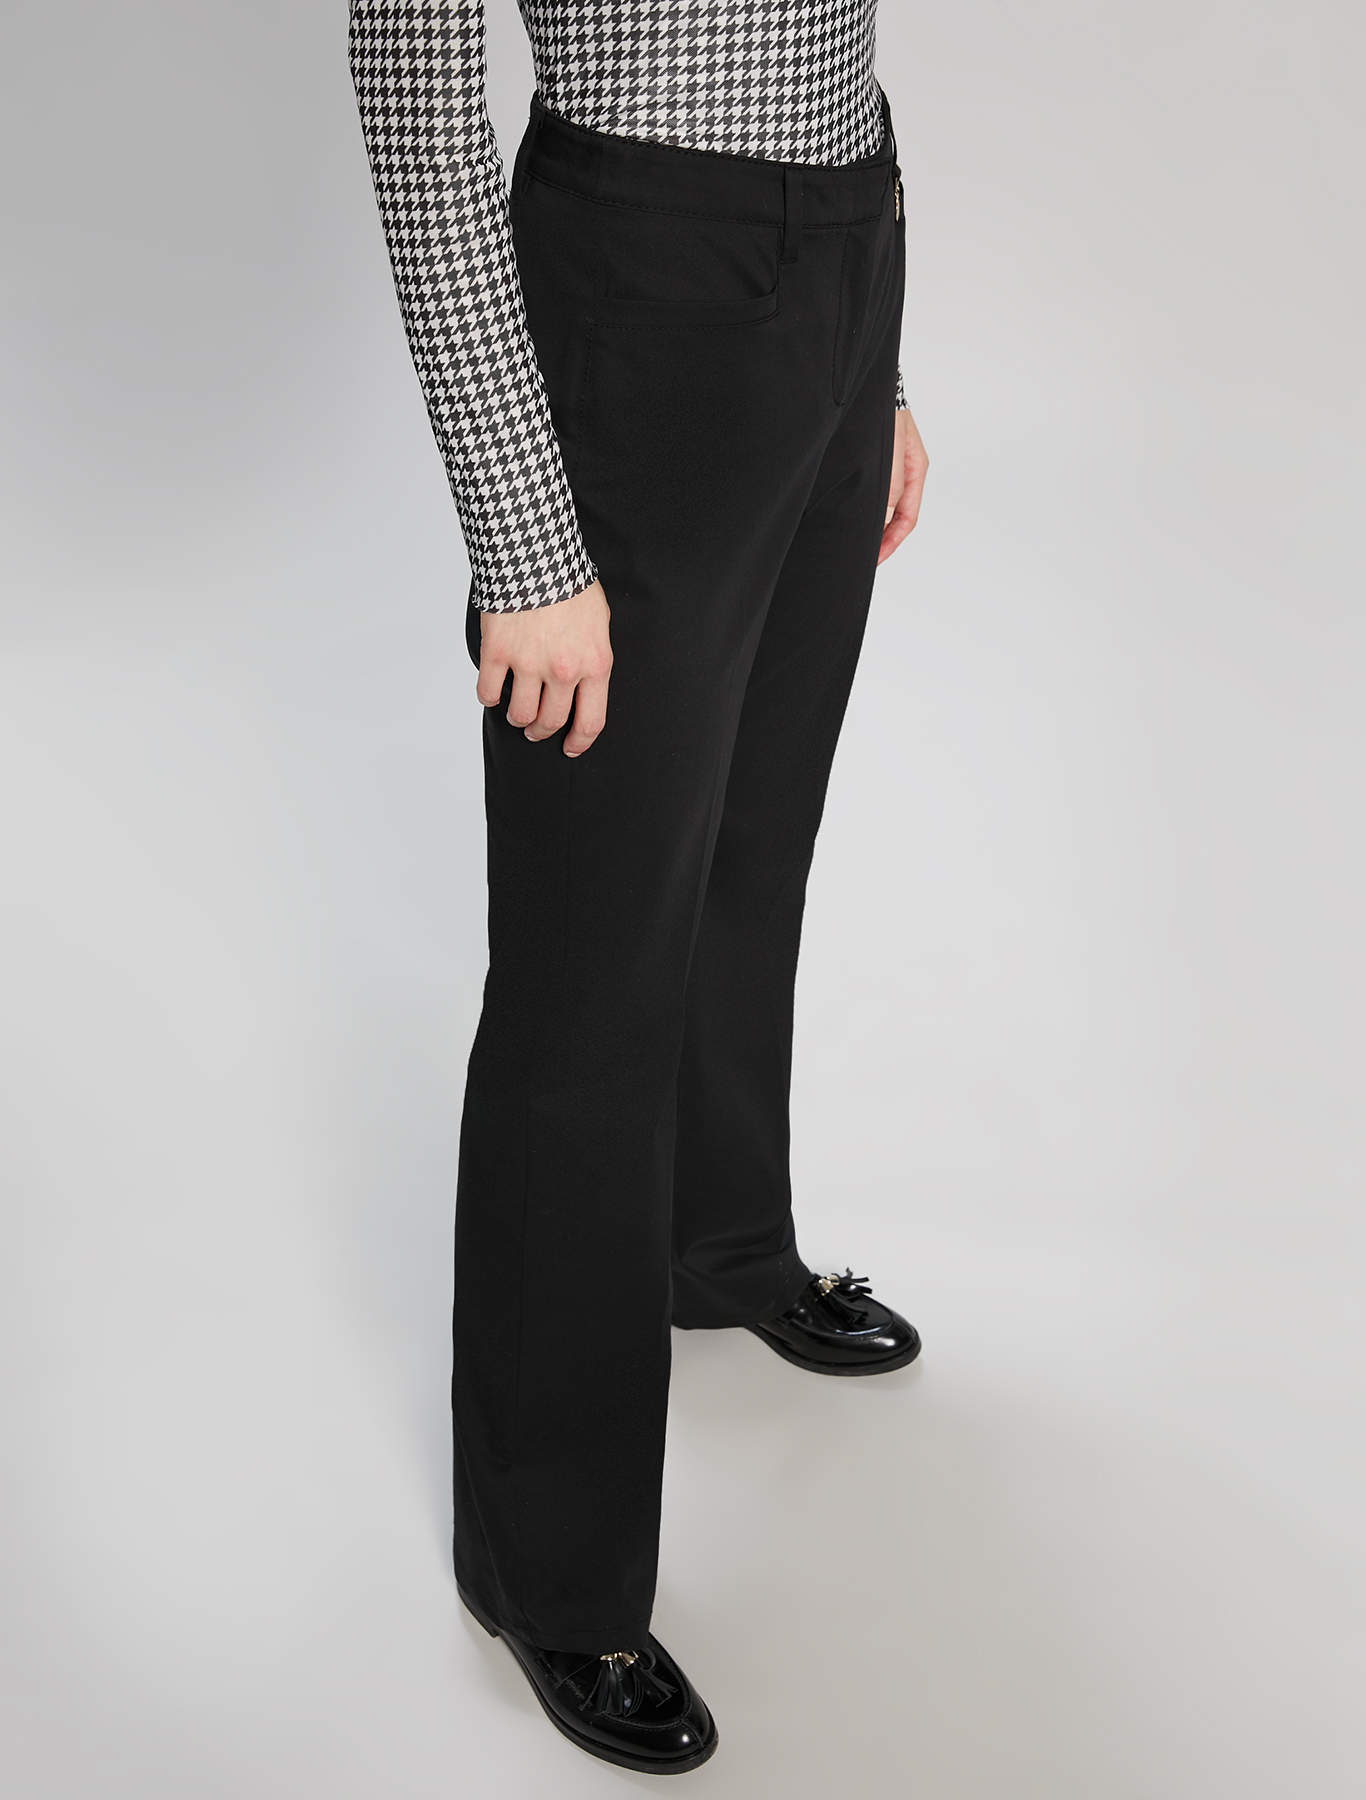 Cotton satin trousers - black - pennyblack